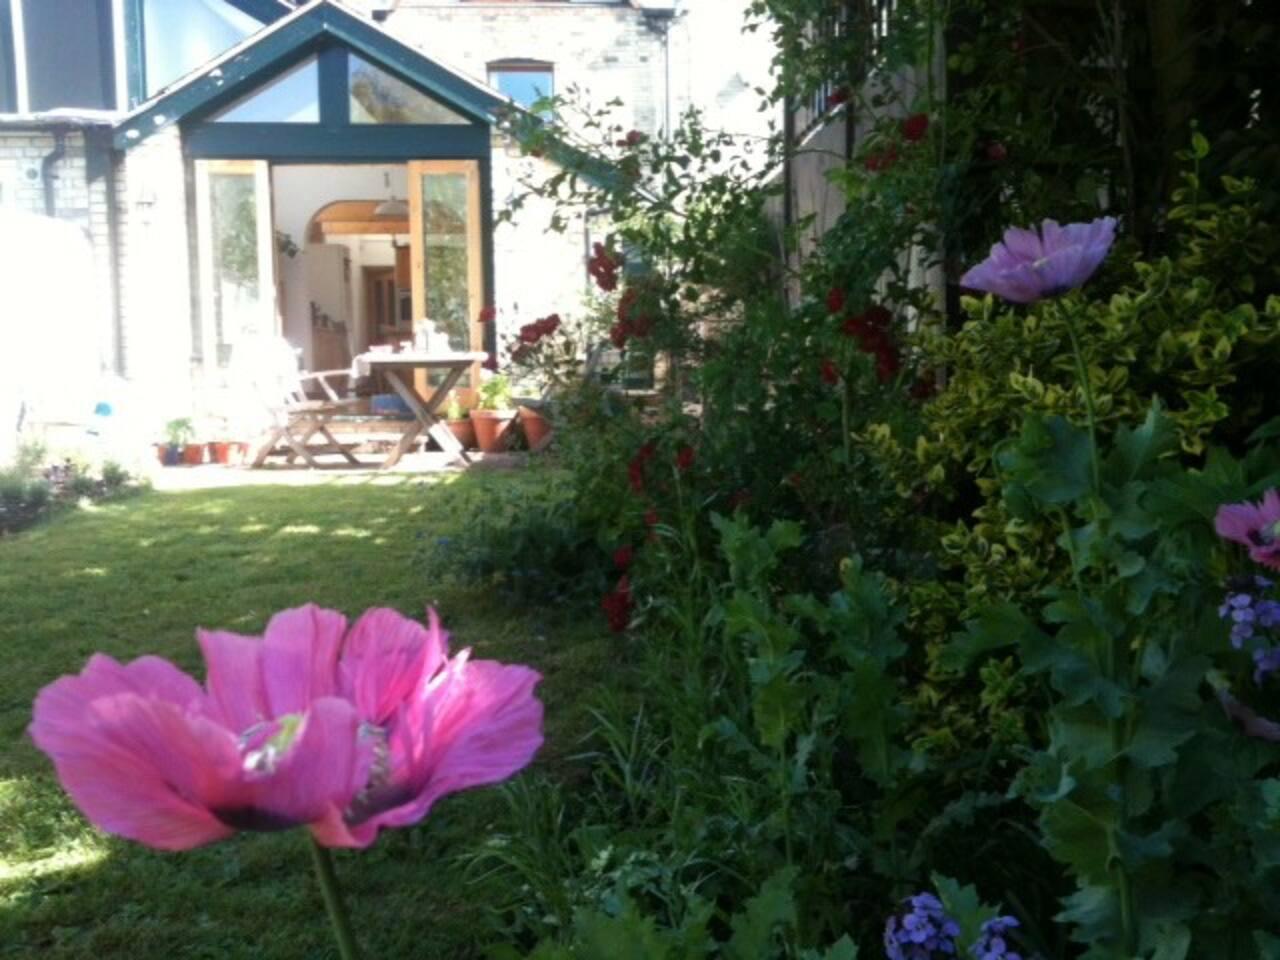 Breakfast in the garden, anyone?